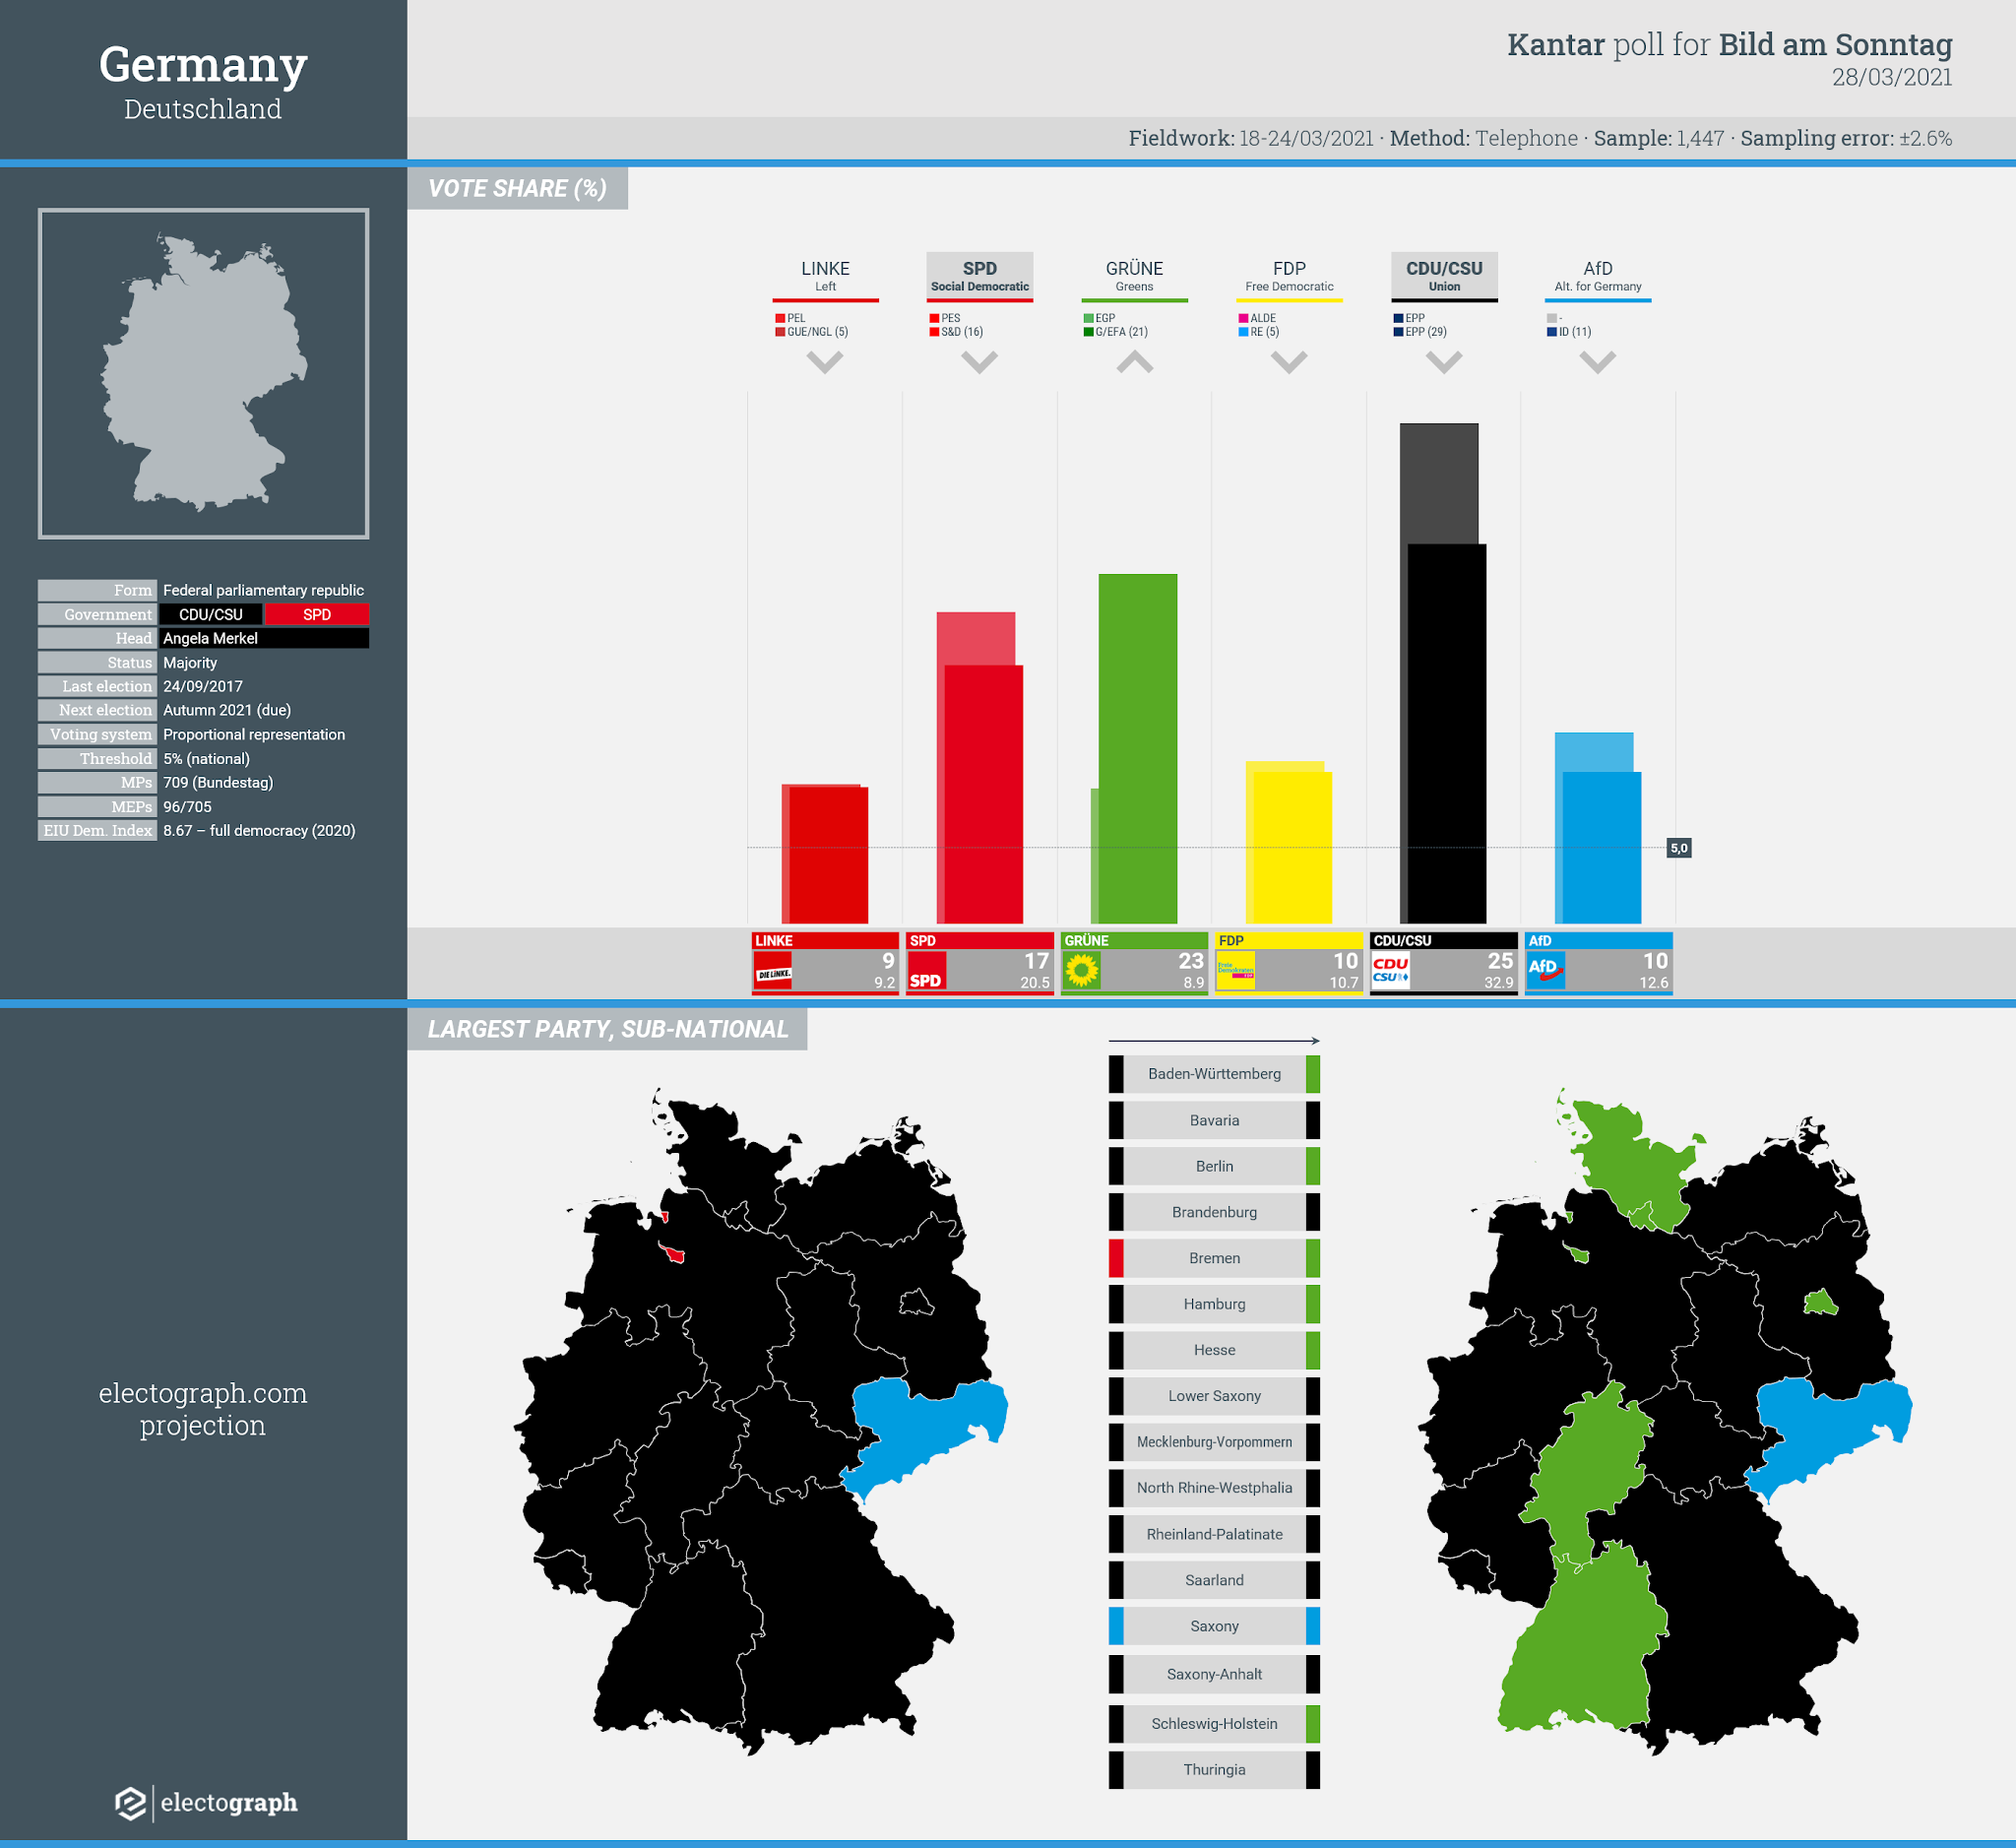 GERMANY: Kantar poll chart for Bild am Sonntag, 28 March 2021